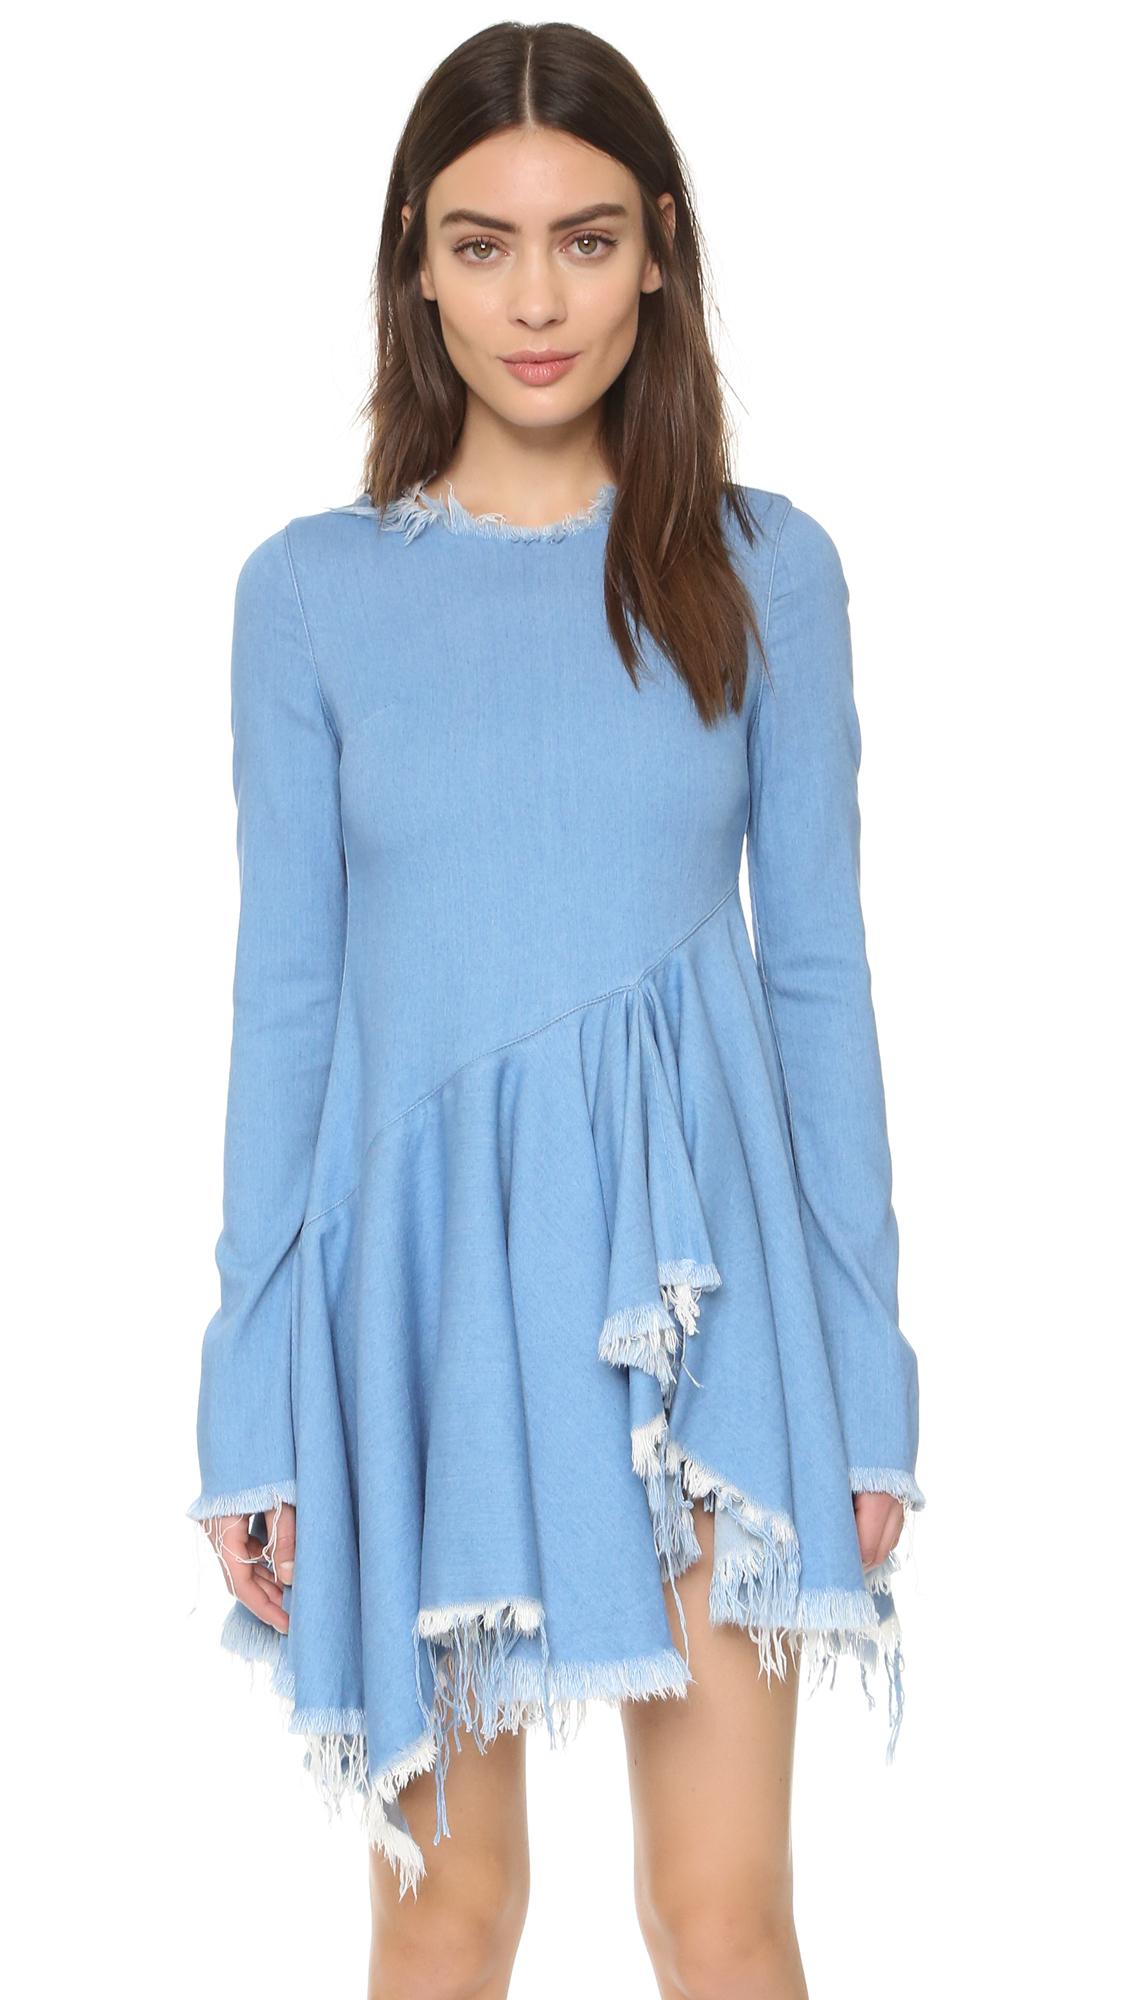 960fb18f0d8 Marques Almeida Denim Dress With Flared Skirt in Blue - Lyst